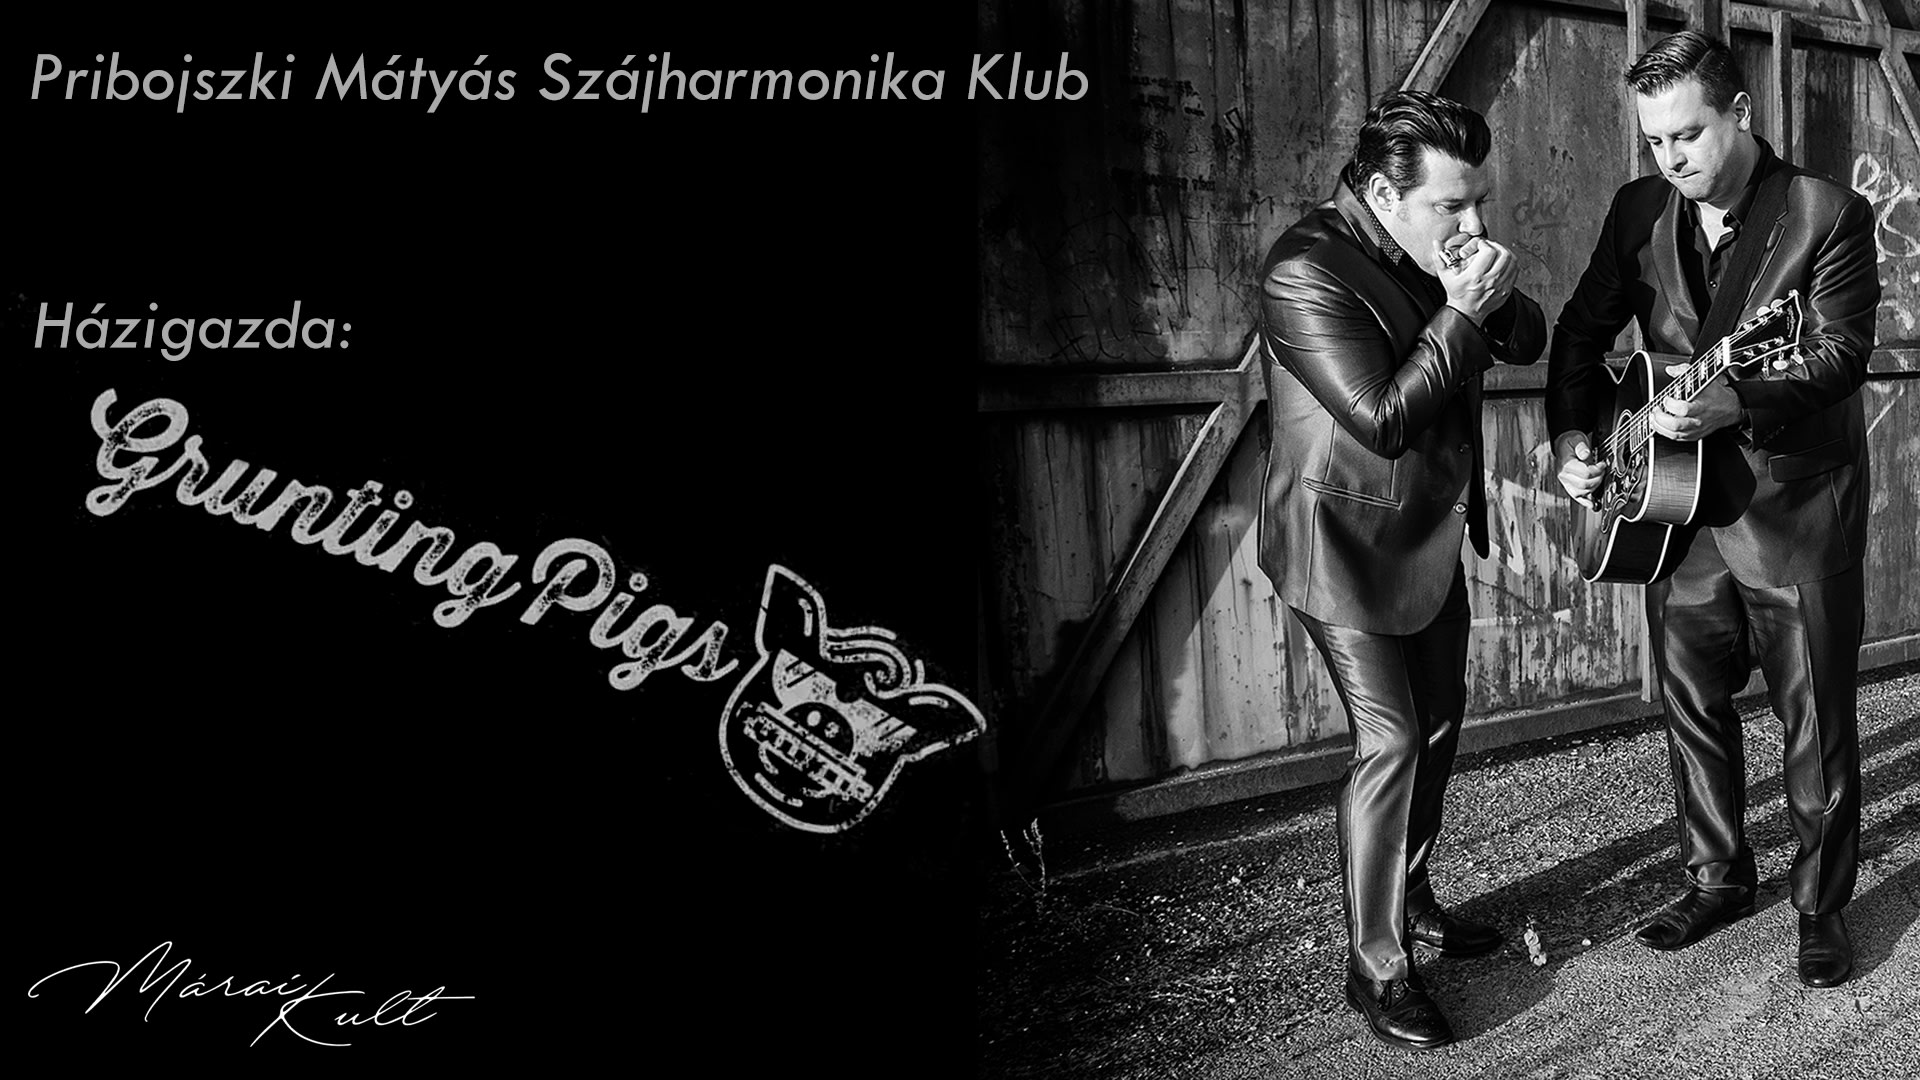 Pribojszki Mátyás Szájharmonika Klub, házigazda: Grunting Pigs